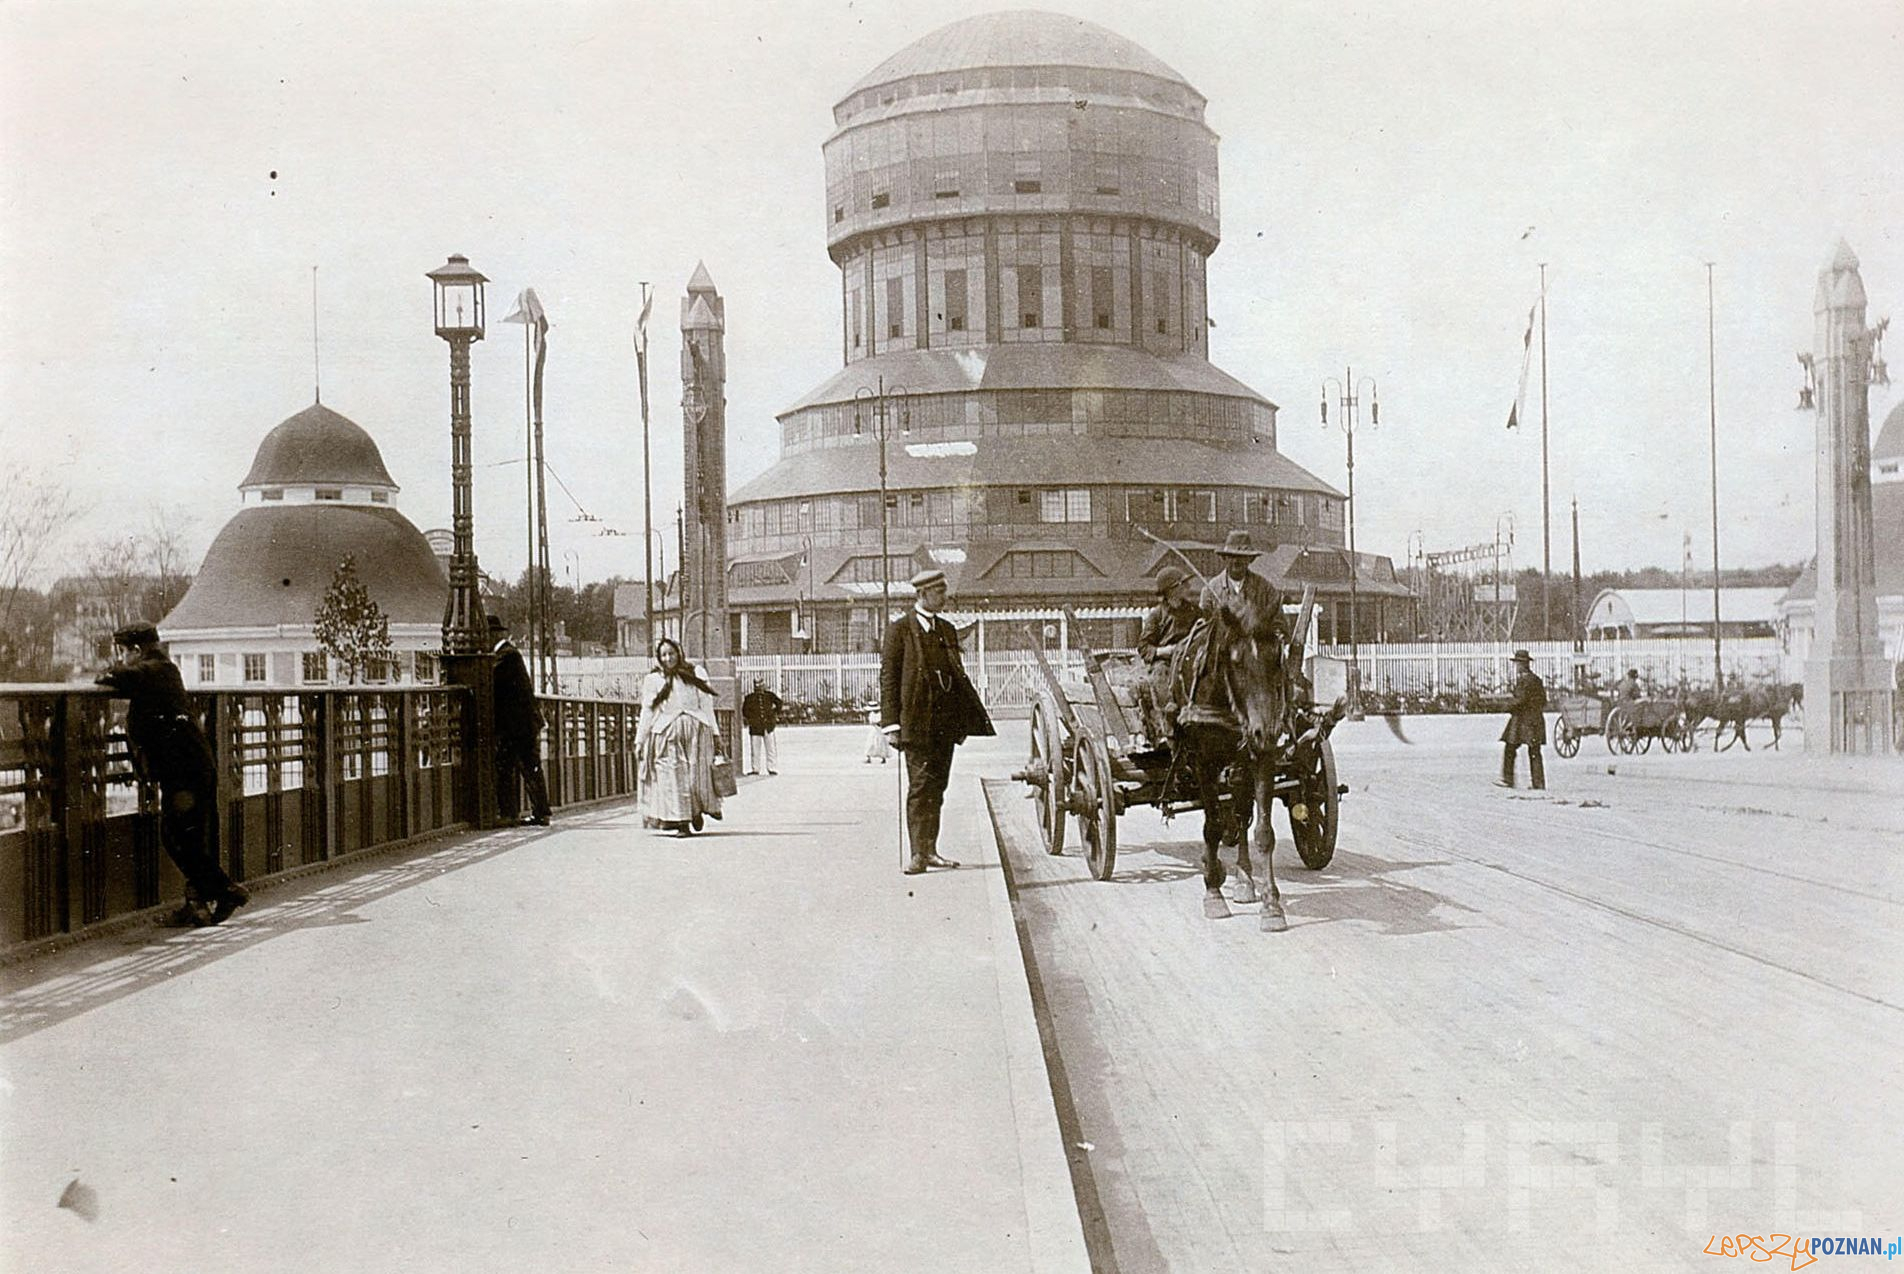 Targi wieża 1911  Foto: Joseph Latzel Ze zb. Brigitte i Everhardta Franßen CK Zamek - Cyryl